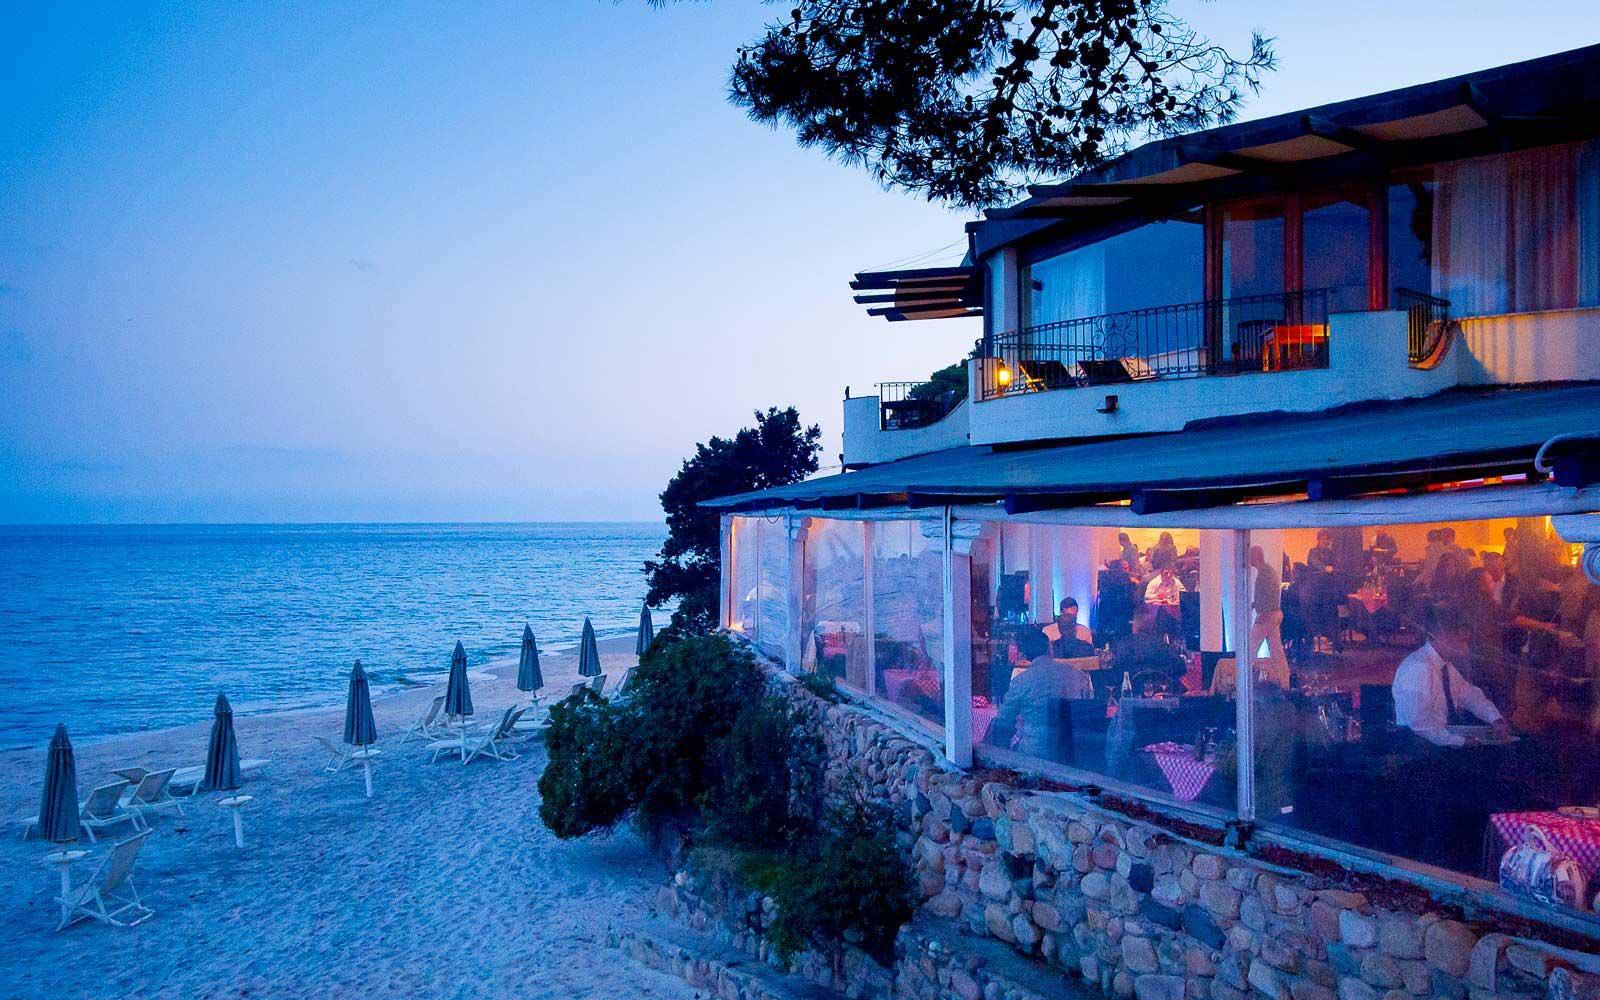 Bellavista restaurant at the Forte Village Resort